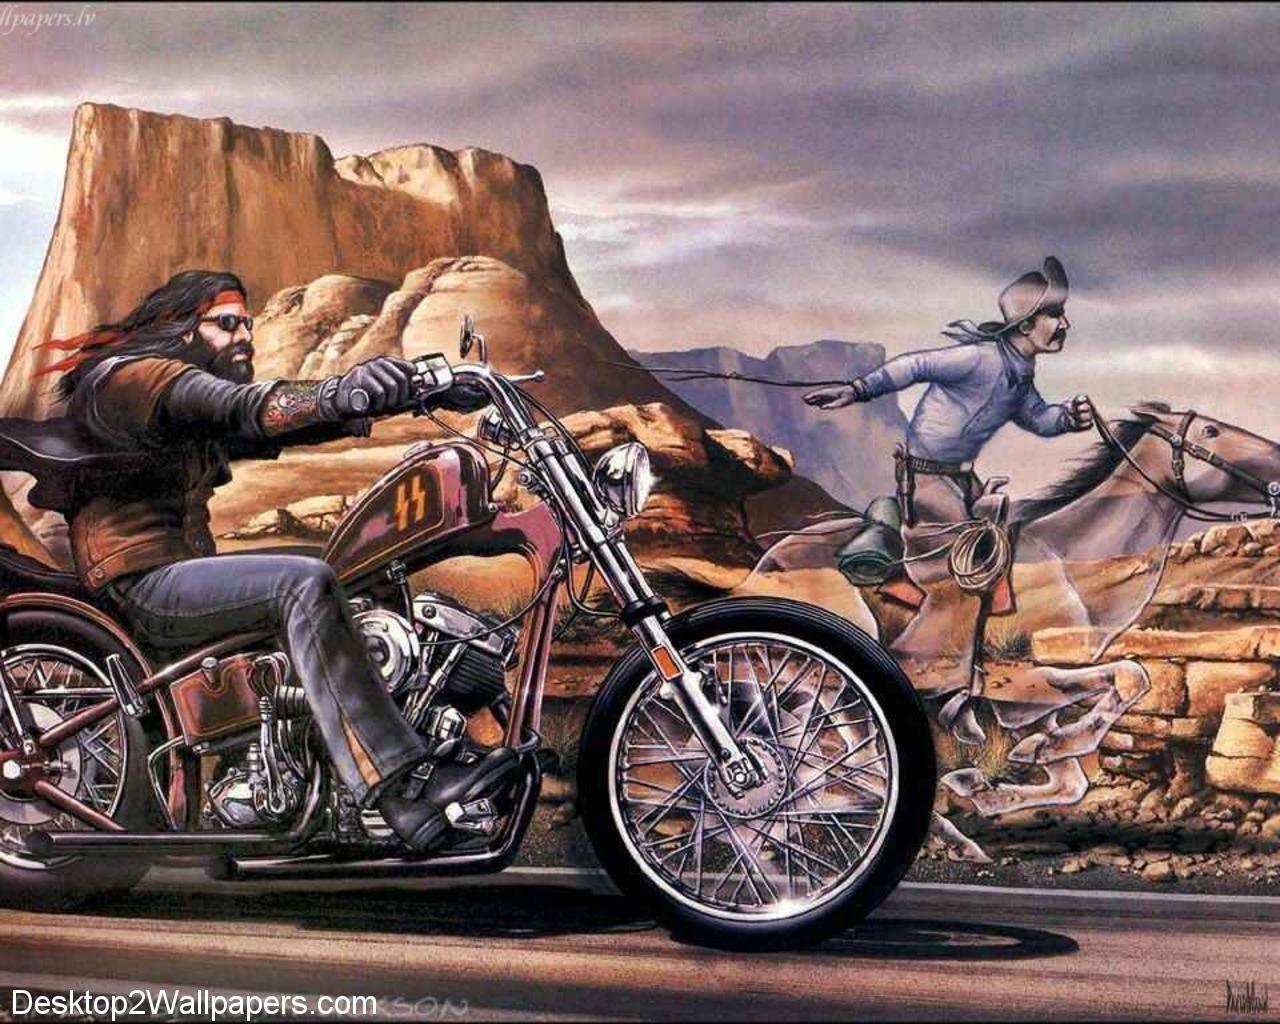 1280x1024 Harley Chopper Babes